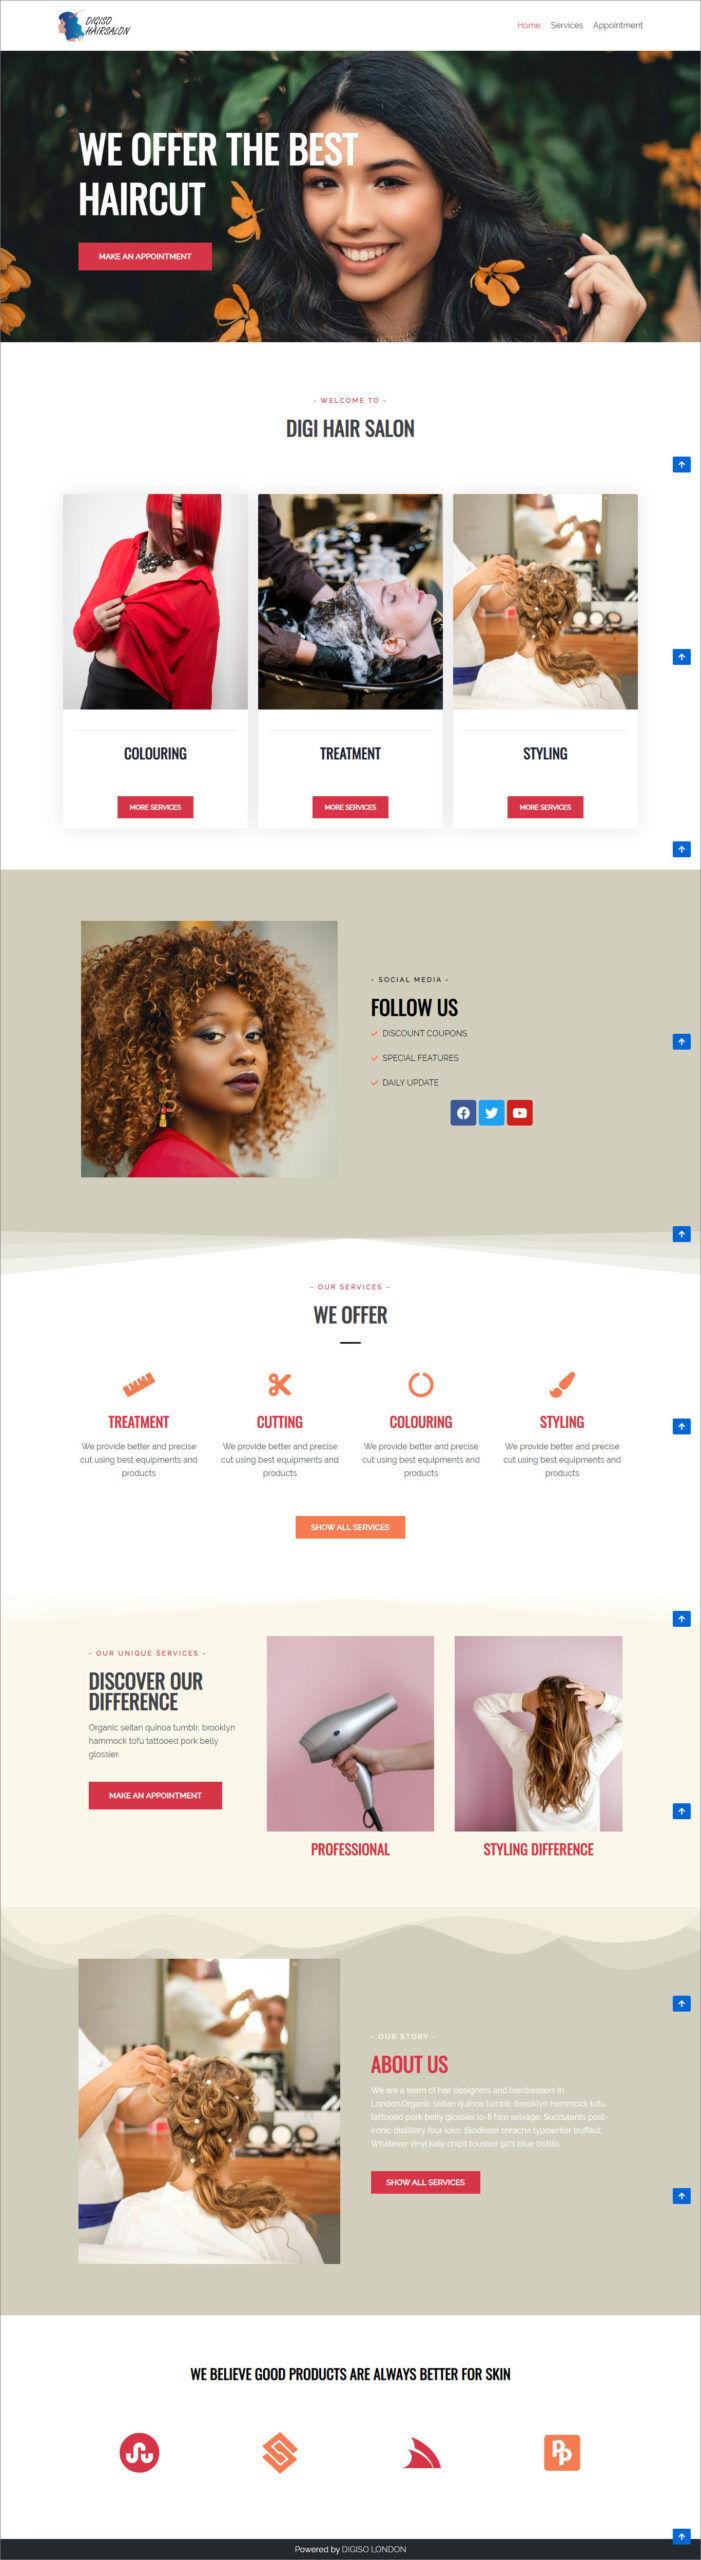 Website For Hairsalon Business